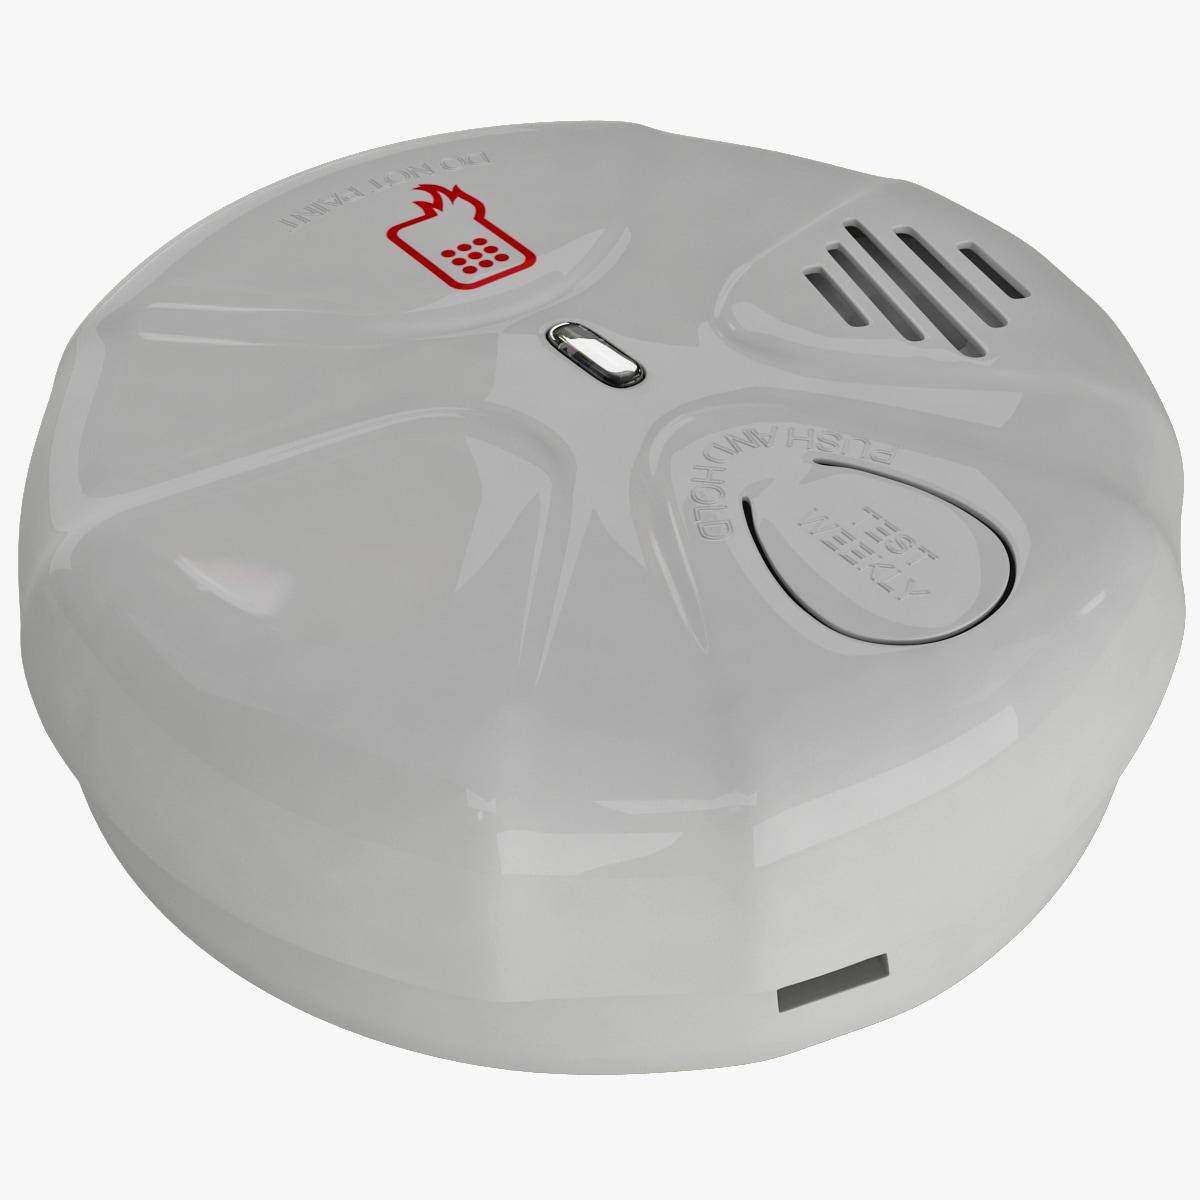 Smoke_Detector_V2_000.jpg